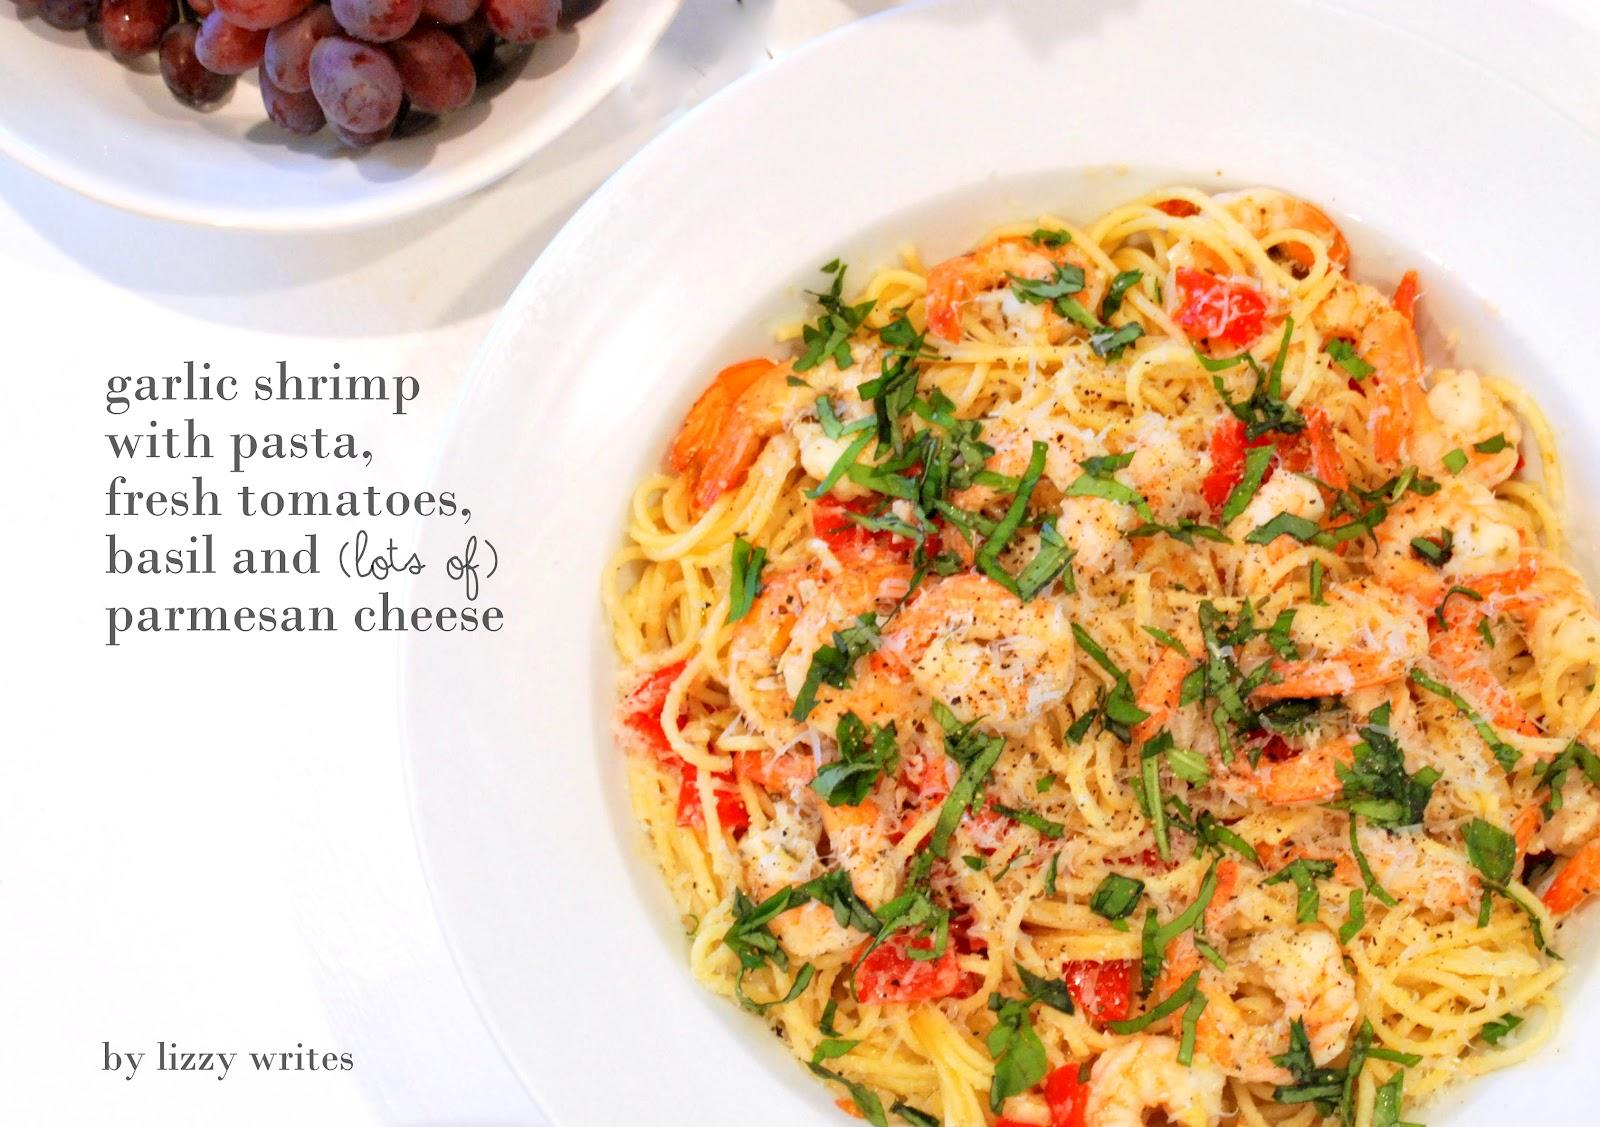 lizzy writes: garlic shrimp pasta